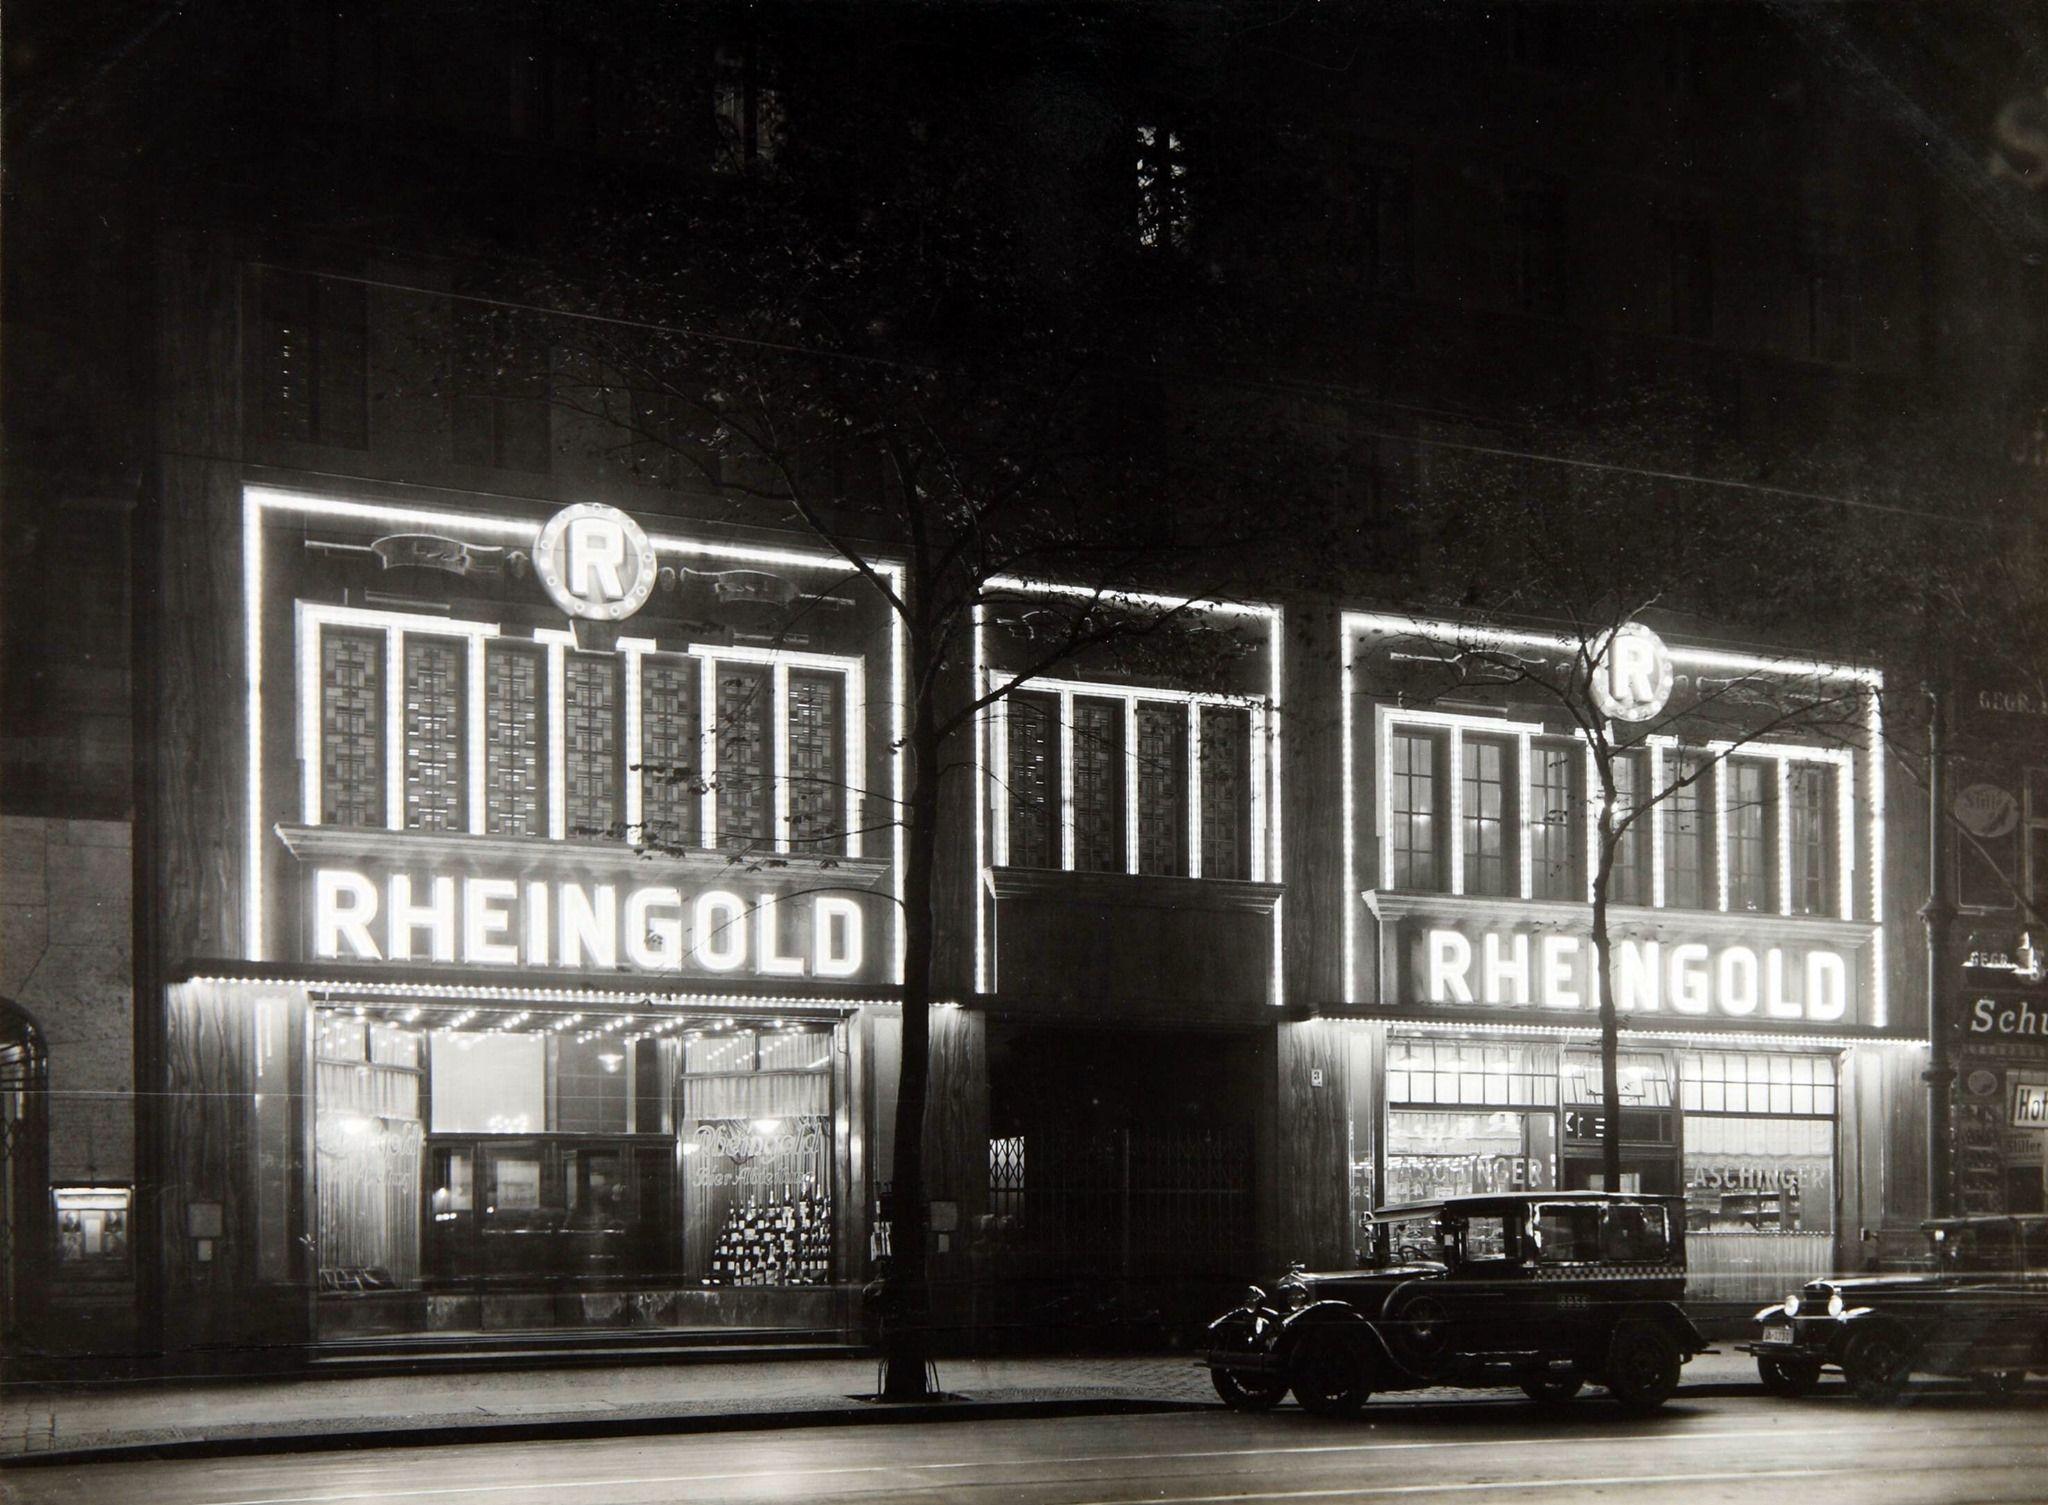 1928 Berlin Weinhaus Rheingold Berlin Im Licht Sammlung Online Stadtmuseum De In 2020 Berlin Photos Berlin Broadway Shows